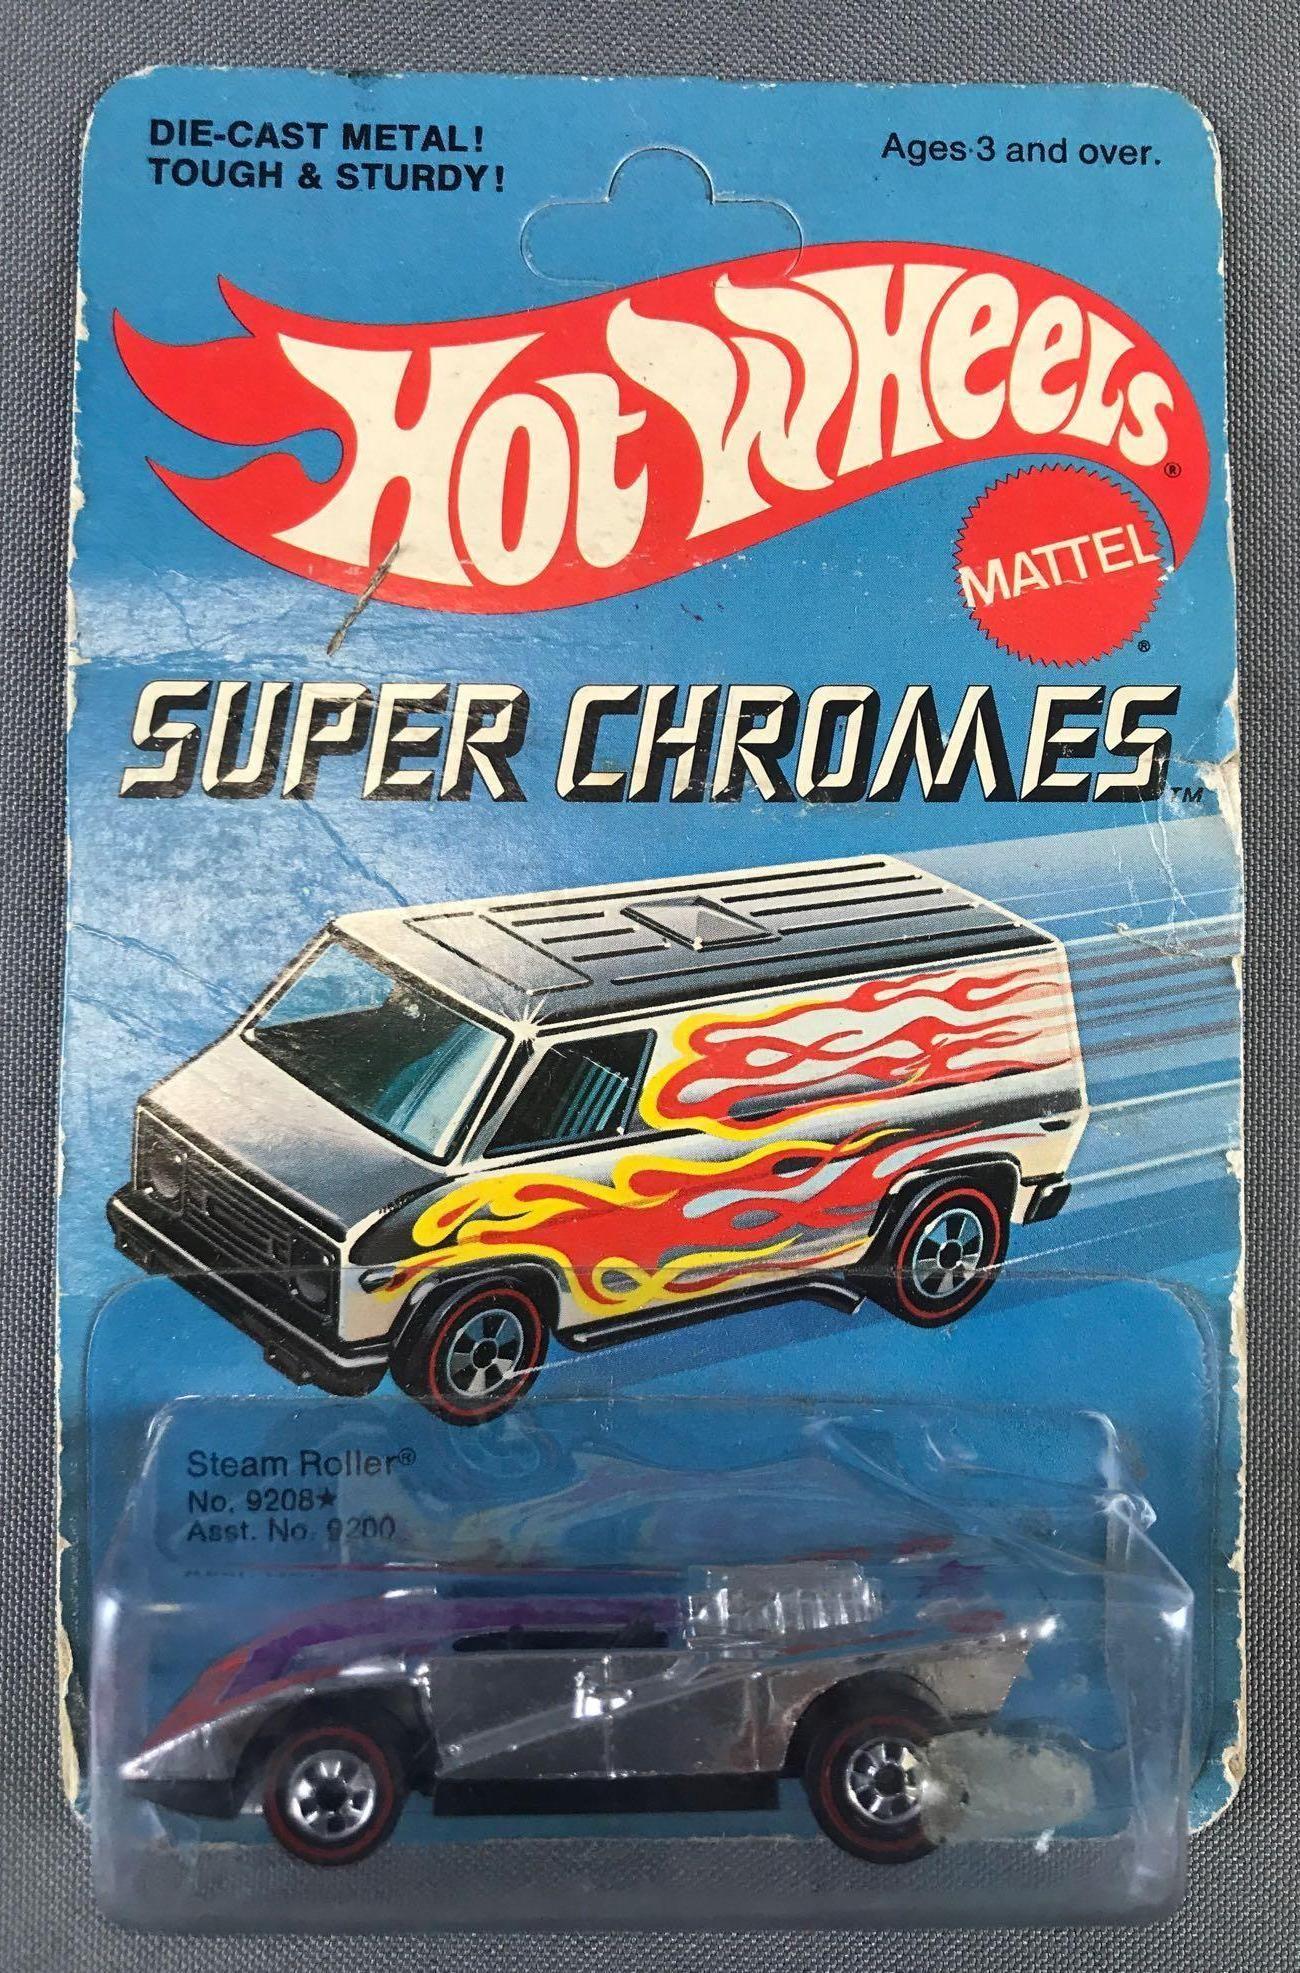 Hot Wheels Redline Super Chromes No. 9208 Steam Roller